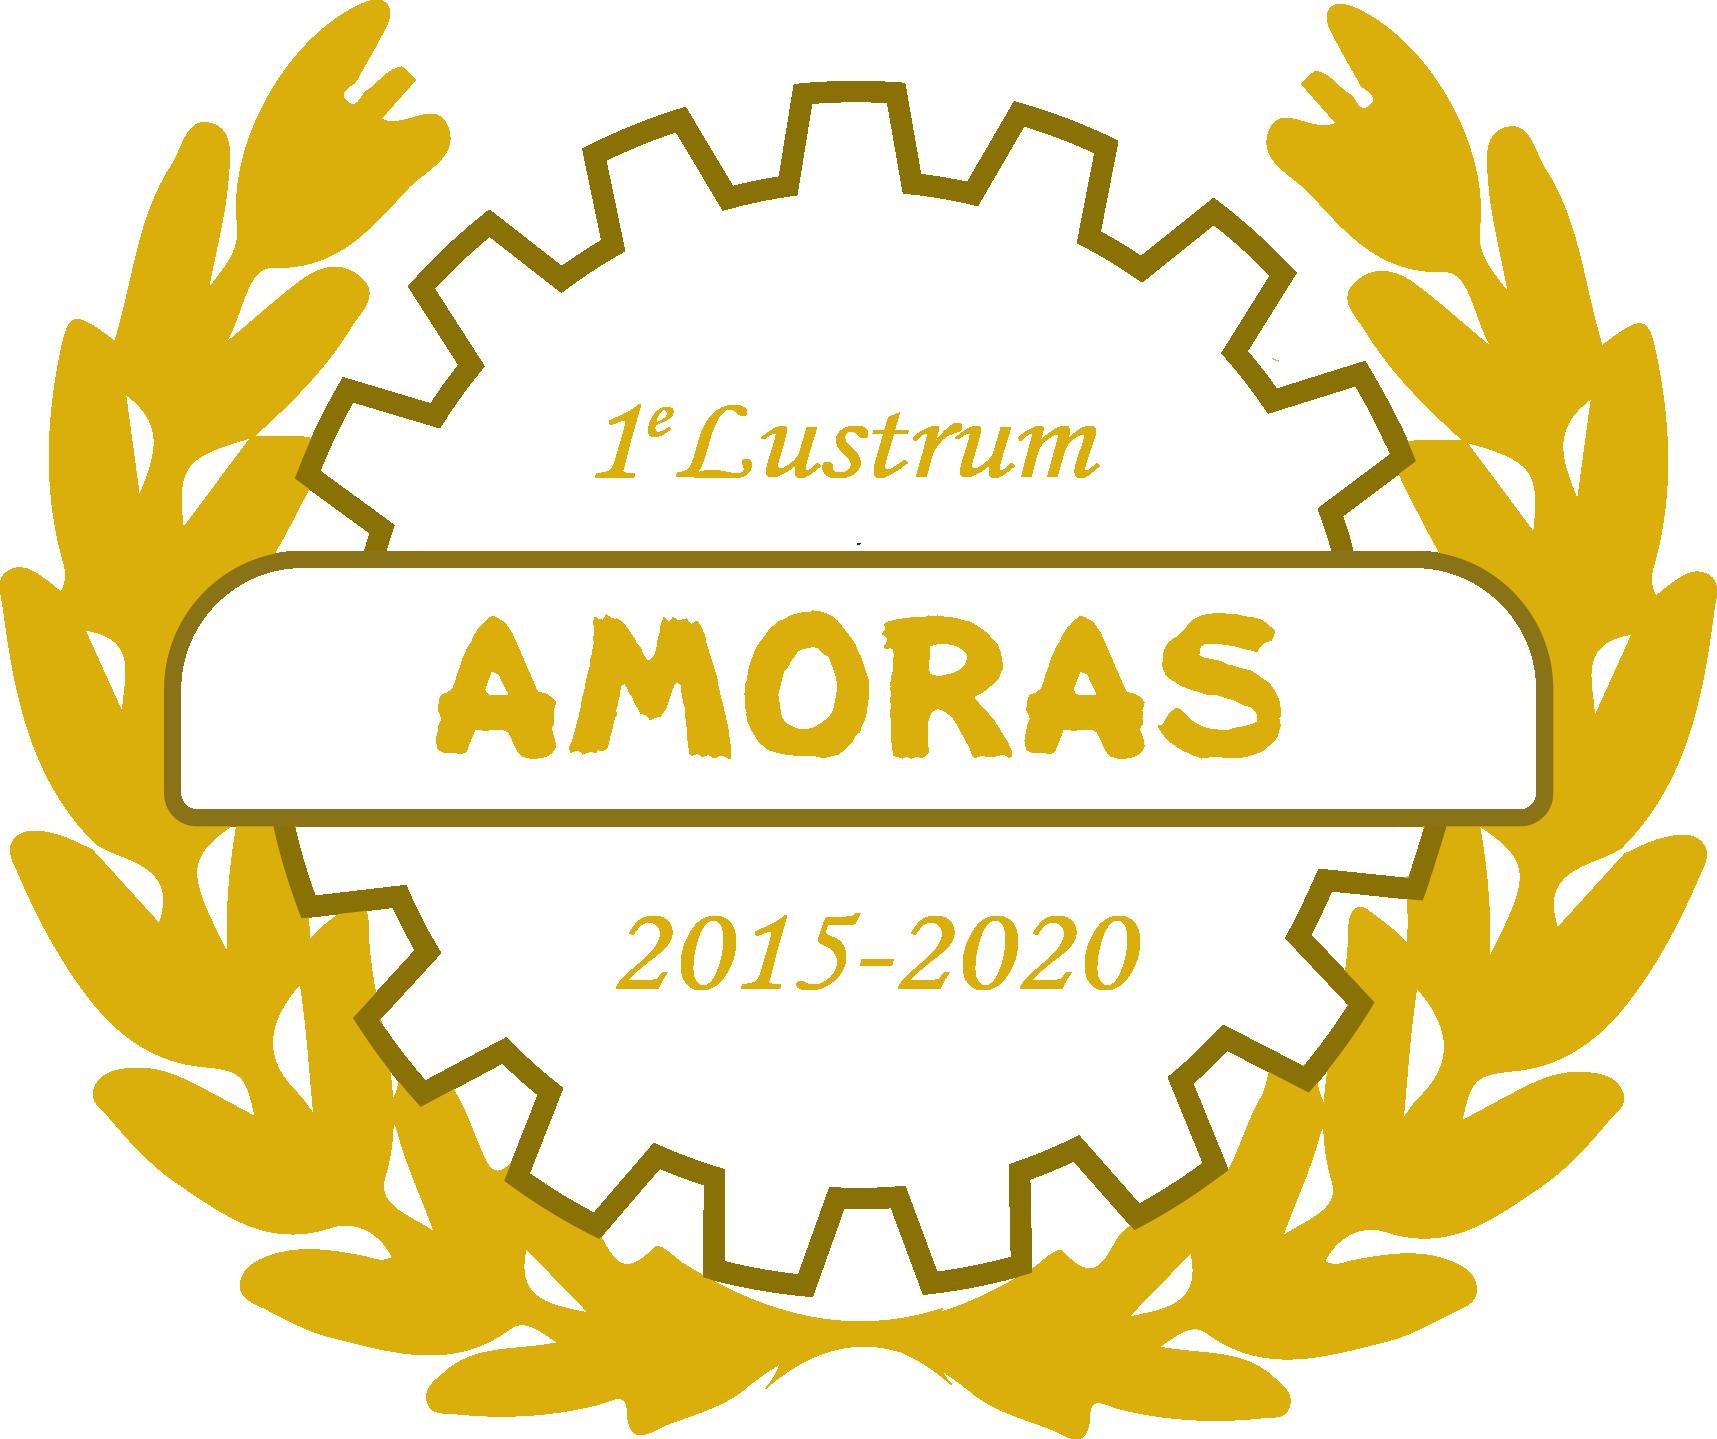 AMORAS Lustrum!!!!